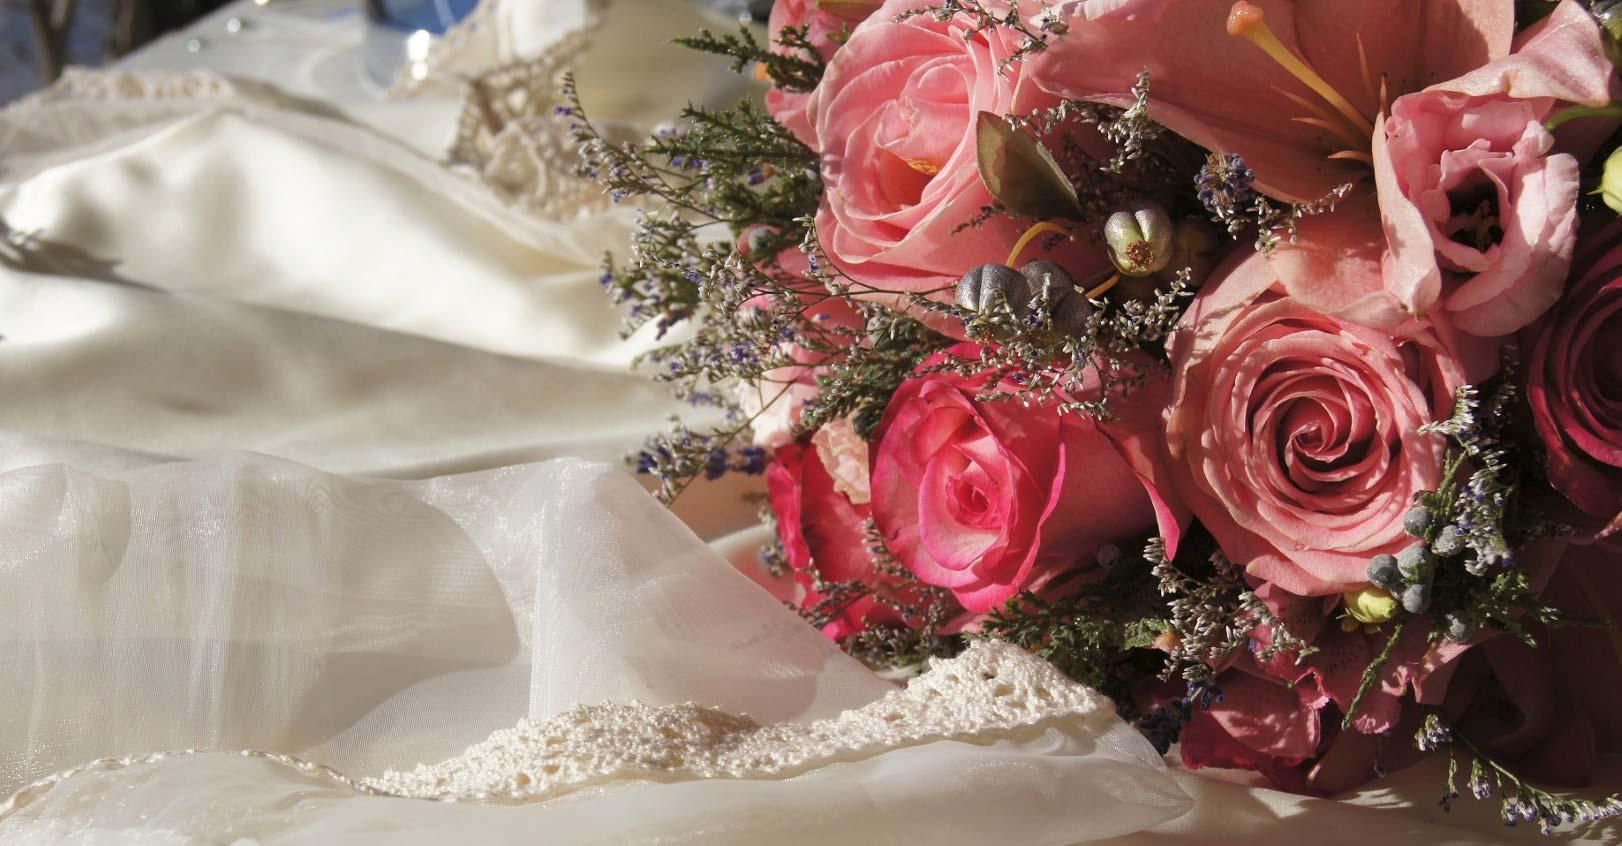 Wedding Bouquets Pink Flowers White Satin Dress